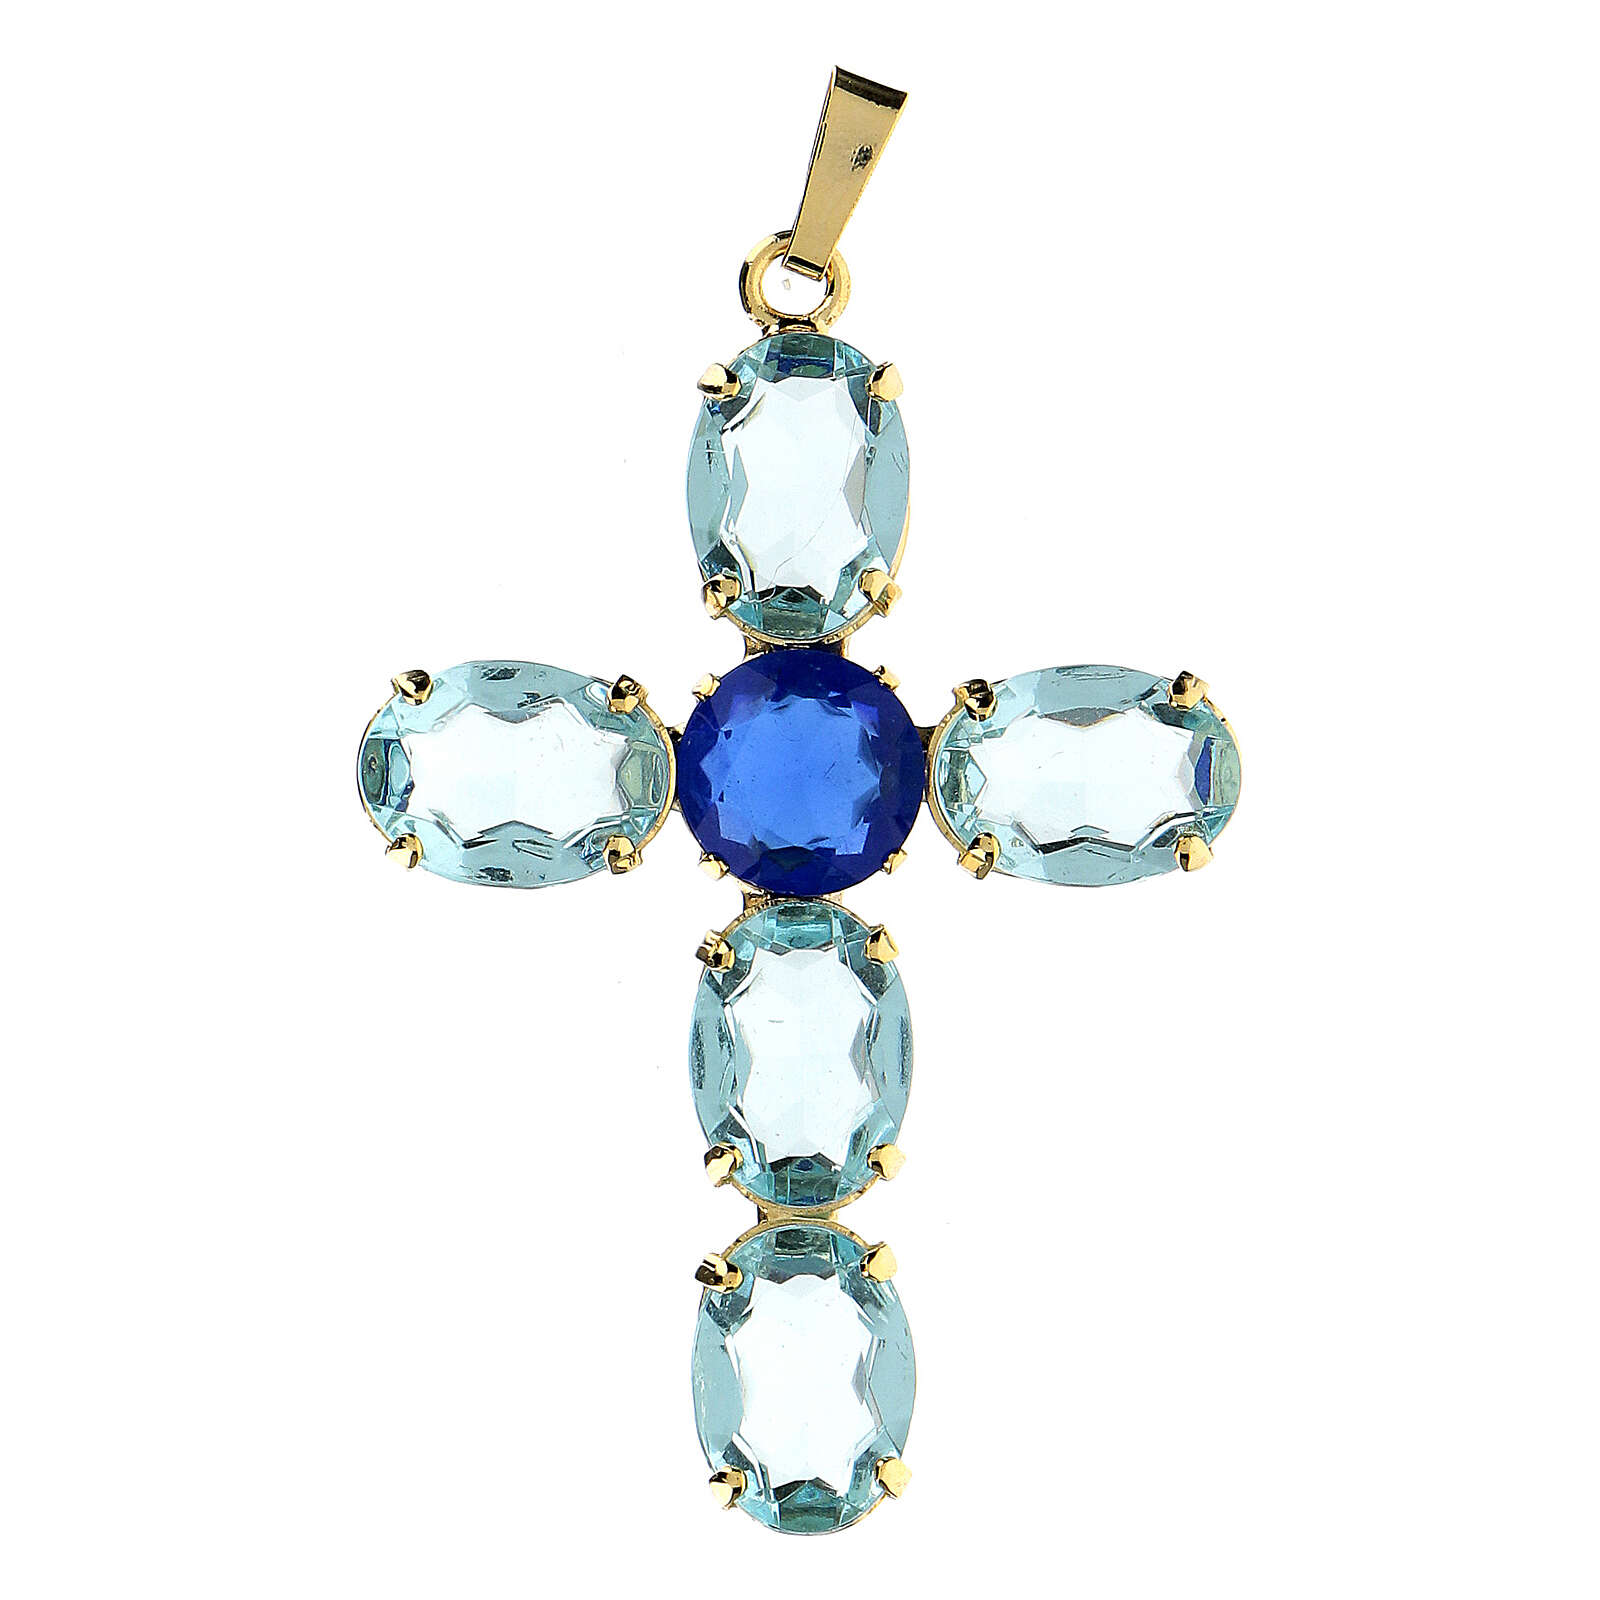 Oval turquoise crystal cross pendant 4